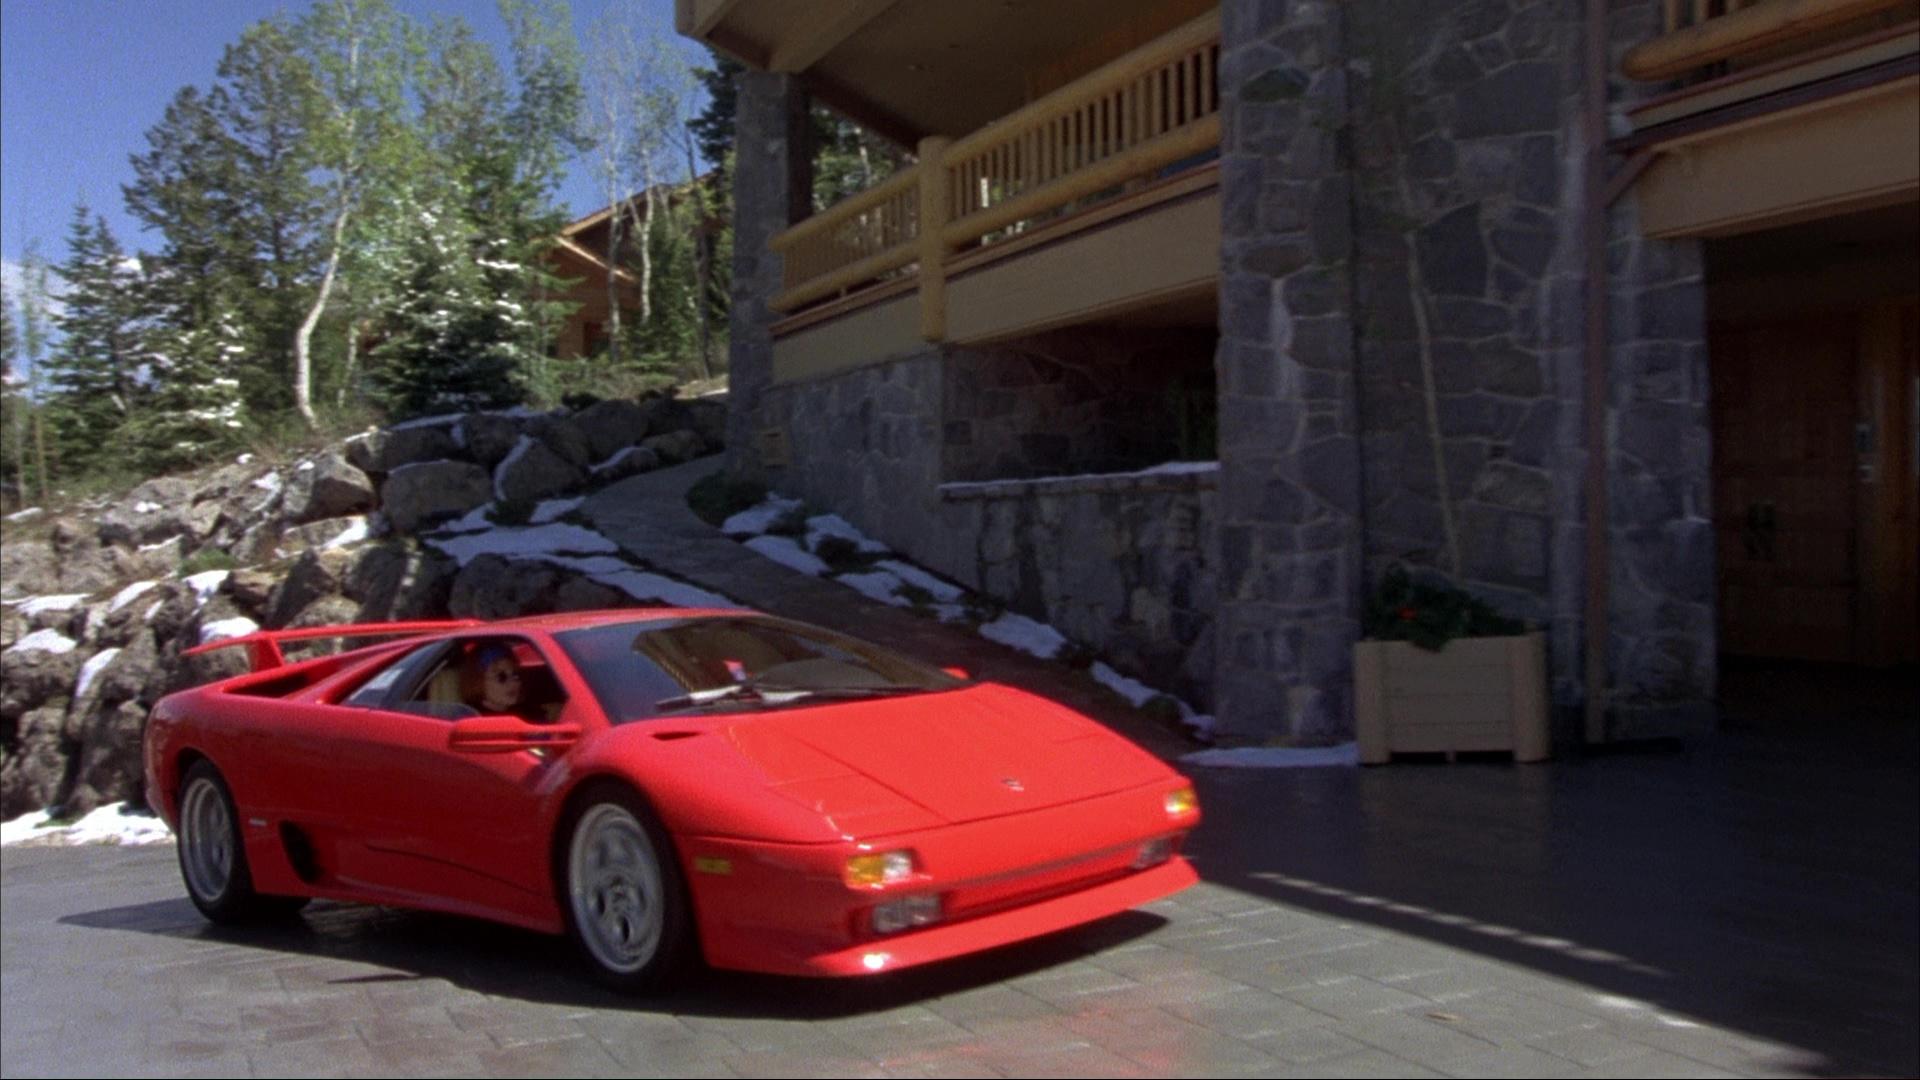 Lamborghini Diablo Red Sports Car Used By Jim Carrey And Jeff